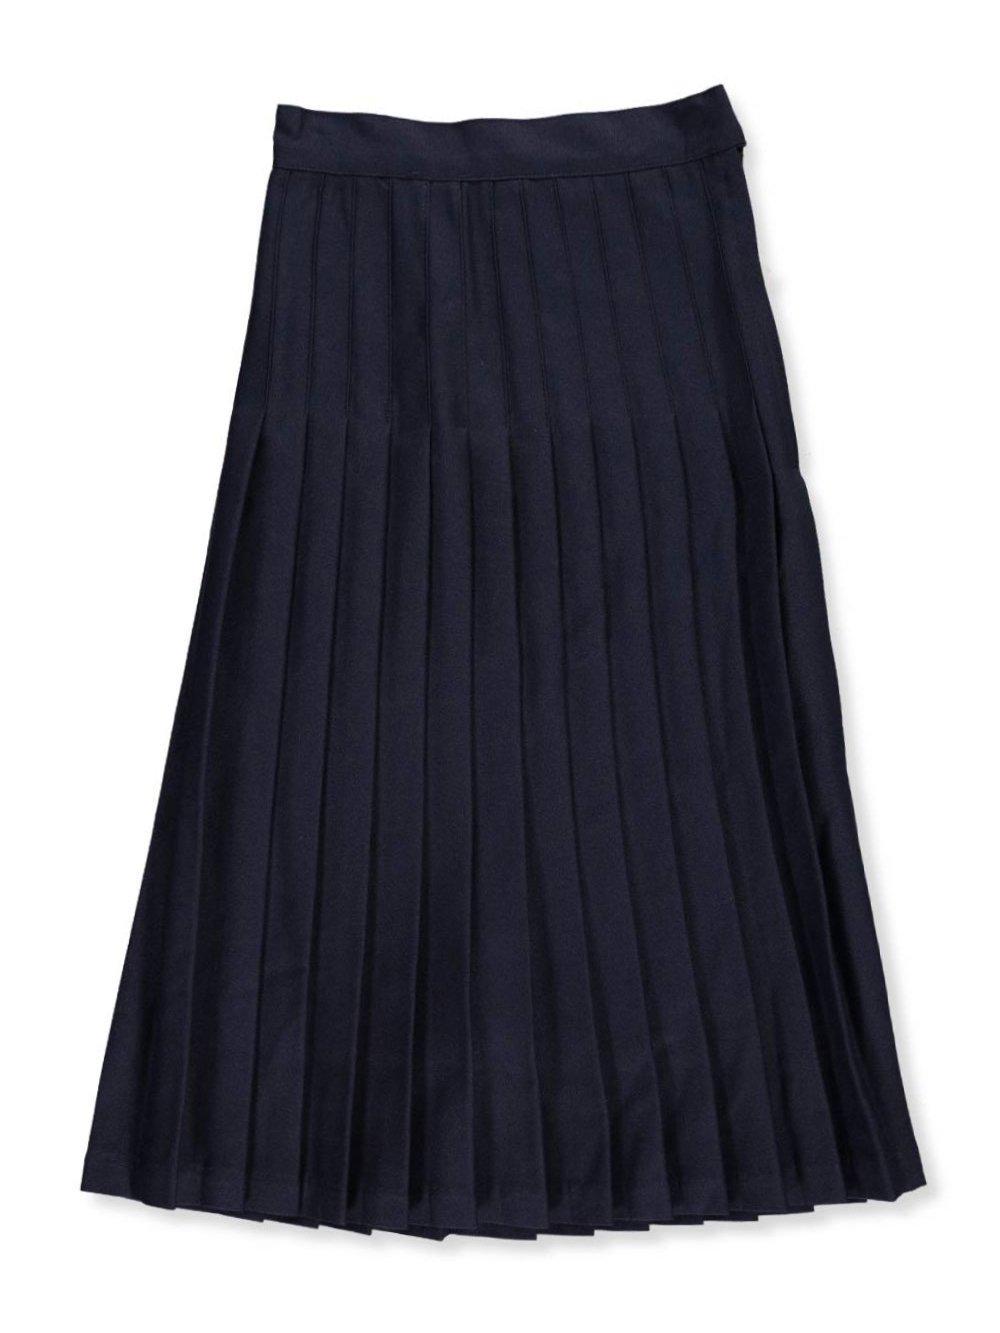 Cookie's Brand Big Girls' Long Pleated Skirt - Navy, 14